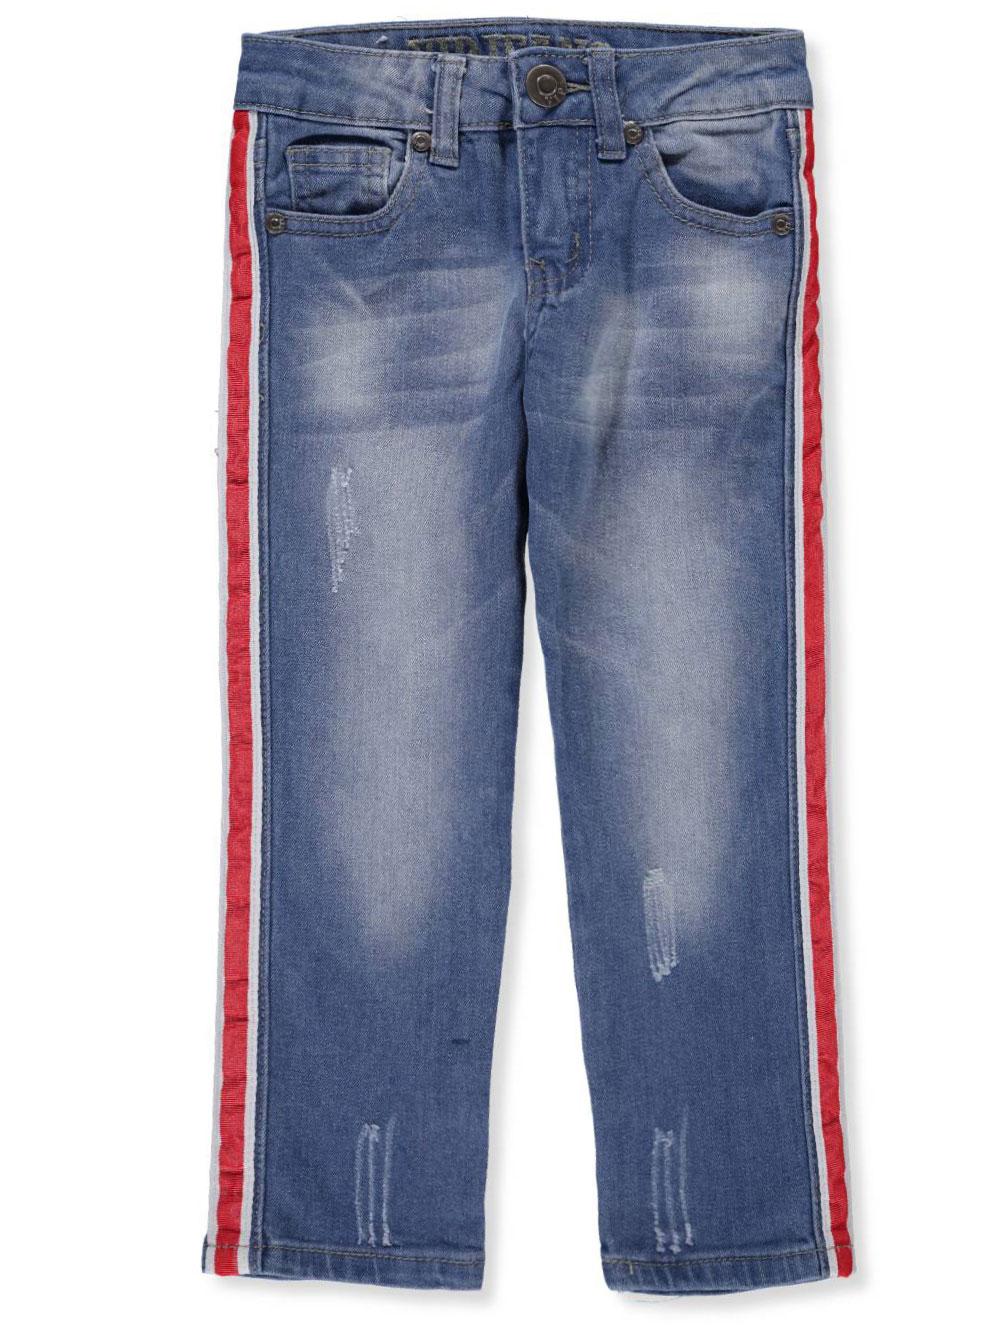 VIP Jeans Girls Shortalls